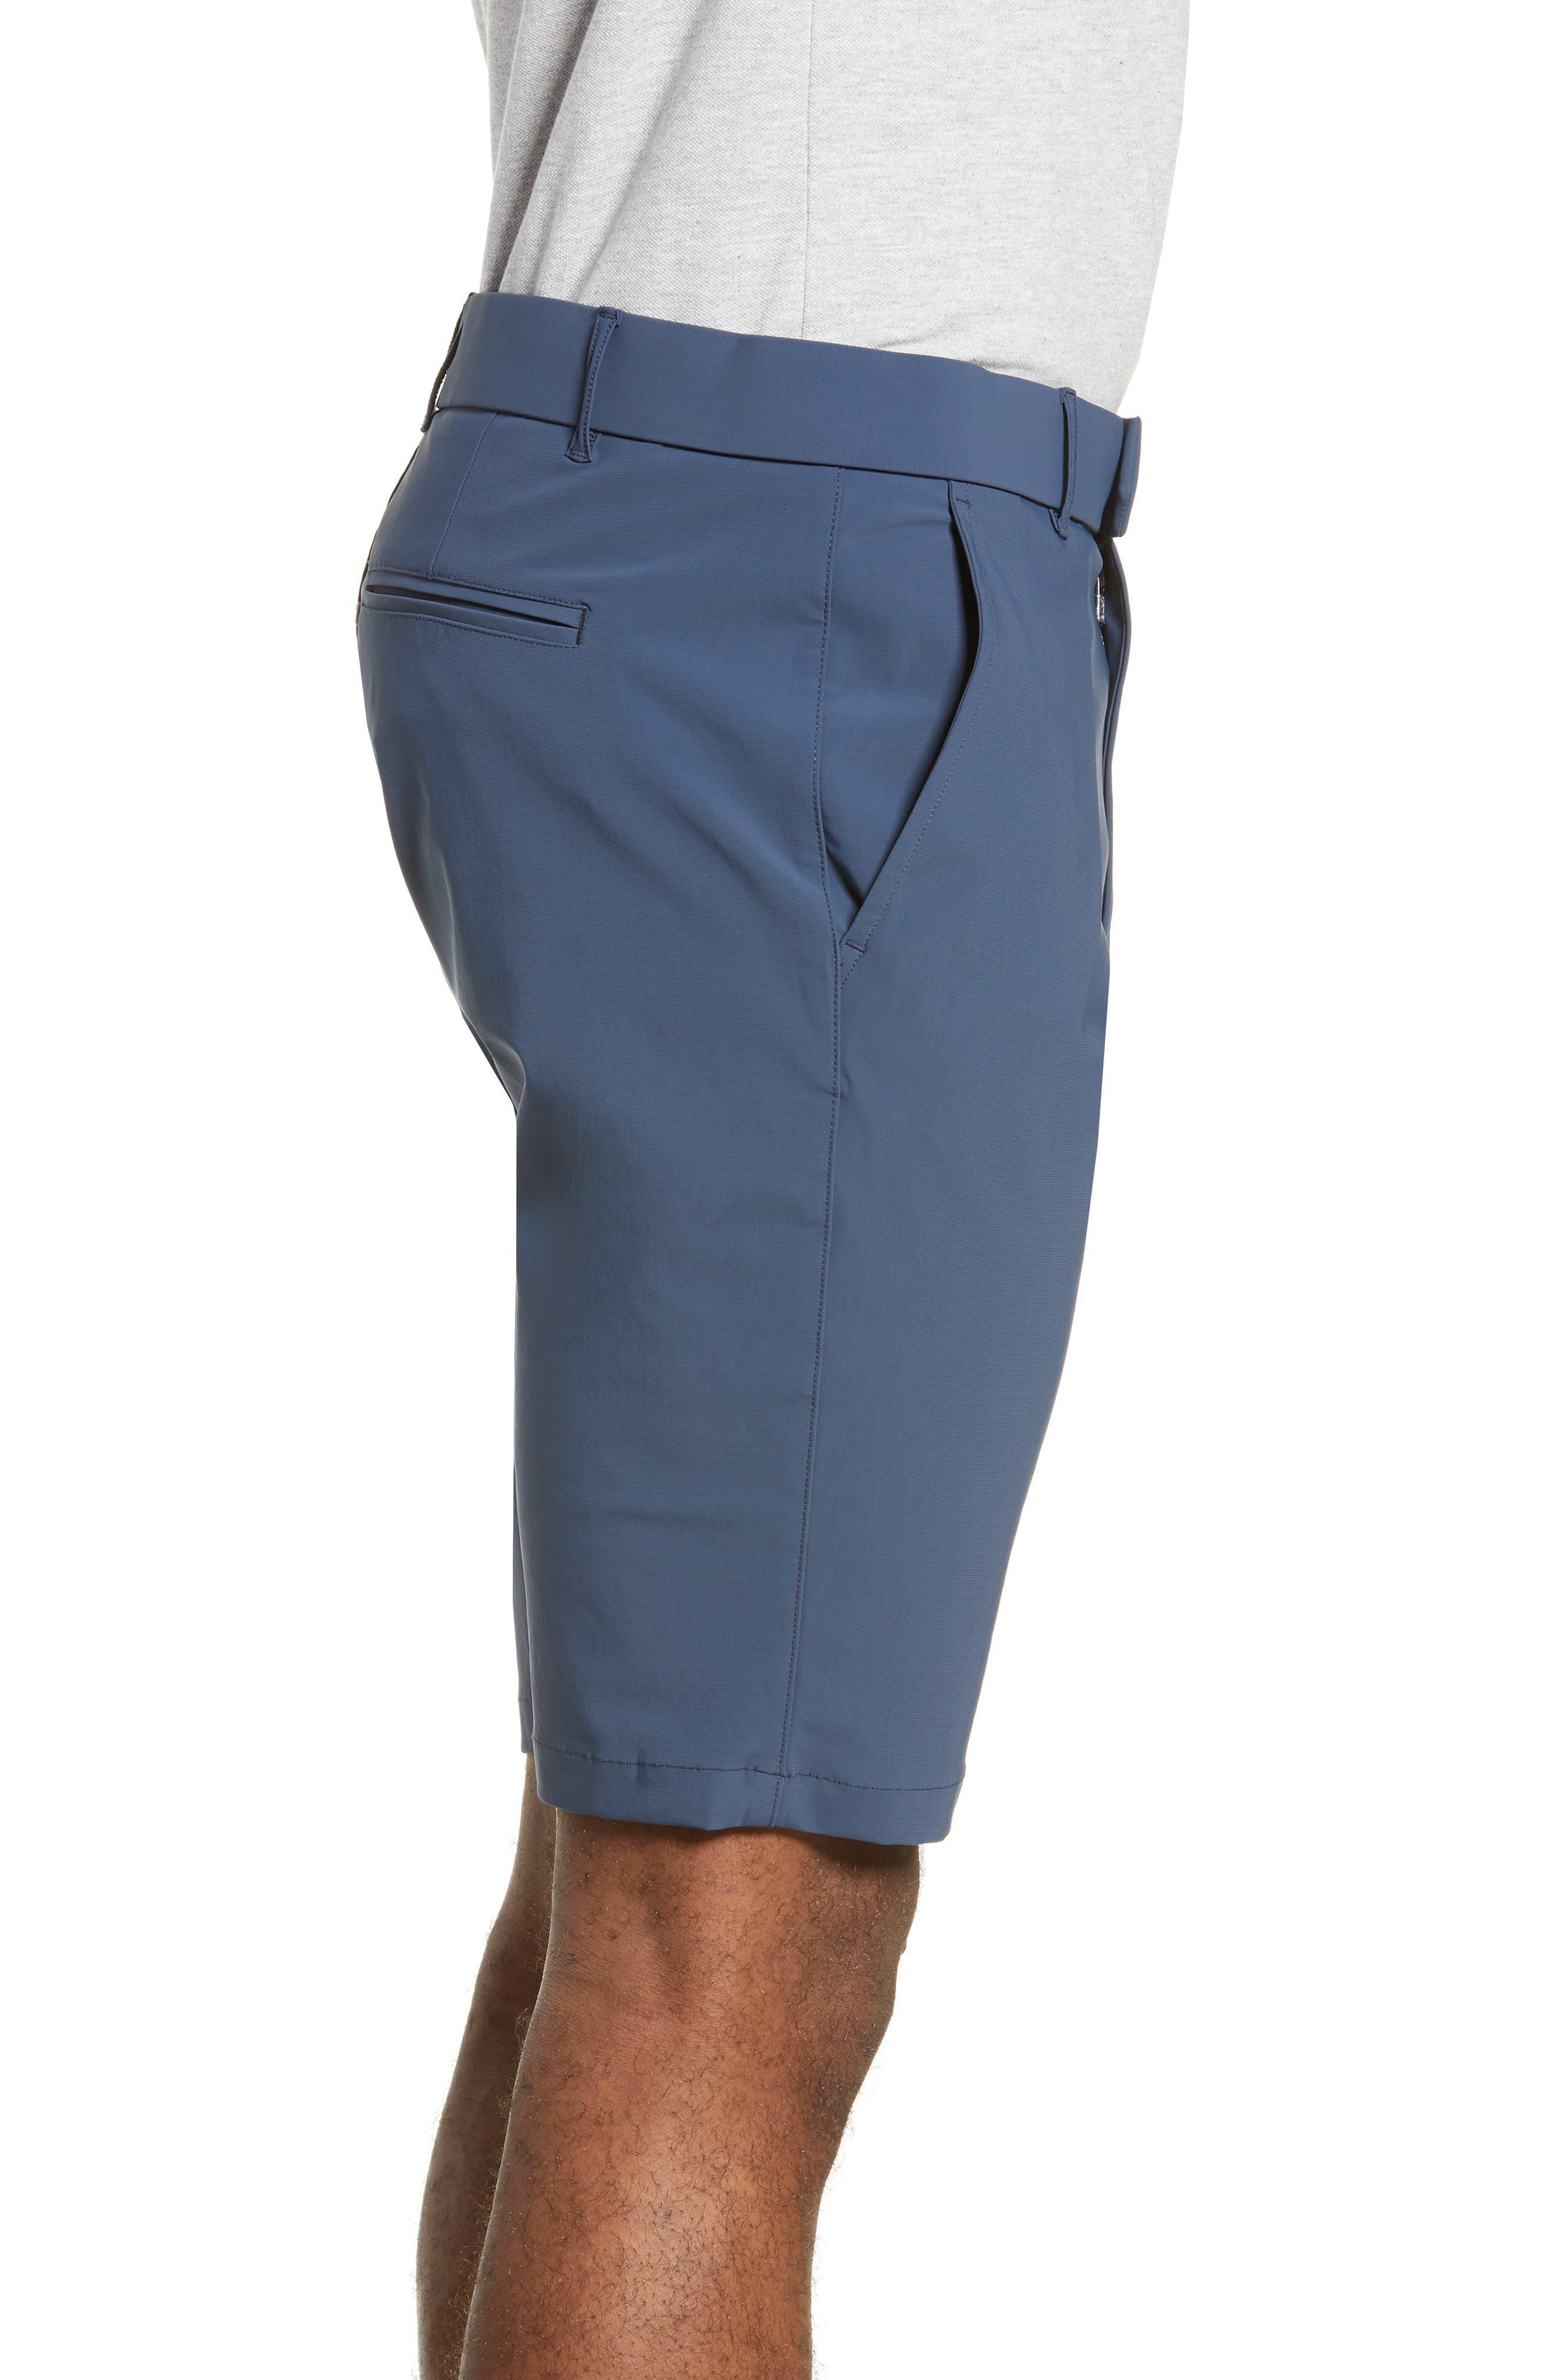 GREYSON, Montauk Technical Shorts, Alternate thumbnail 4, color, EEL